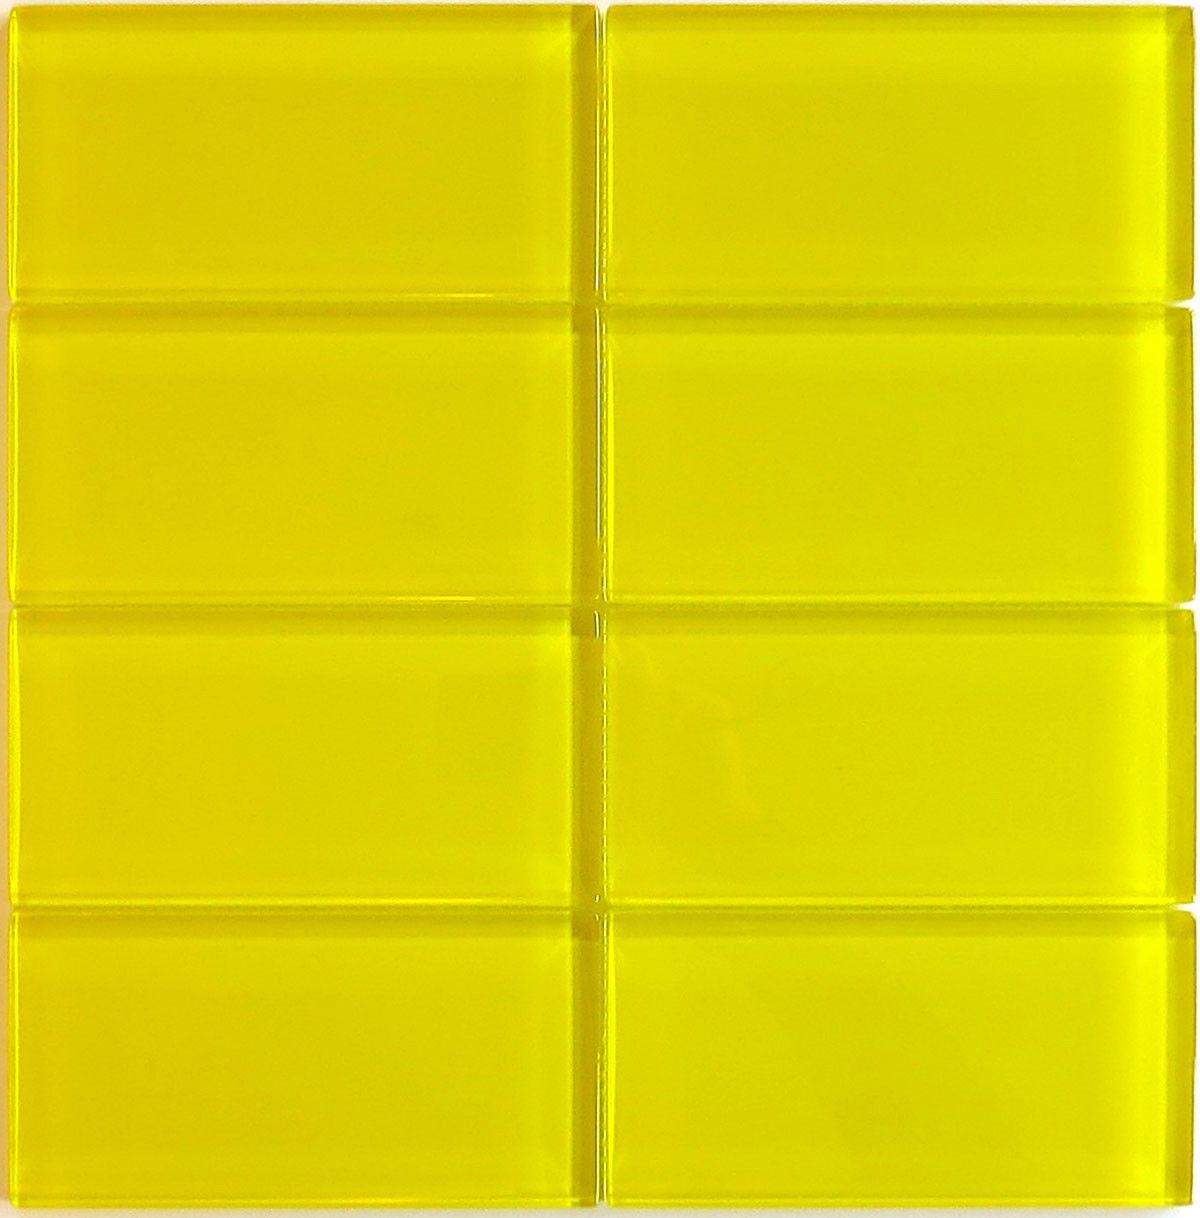 Lush Er Yellow Gl Subway Tile Is A Fresh Bright